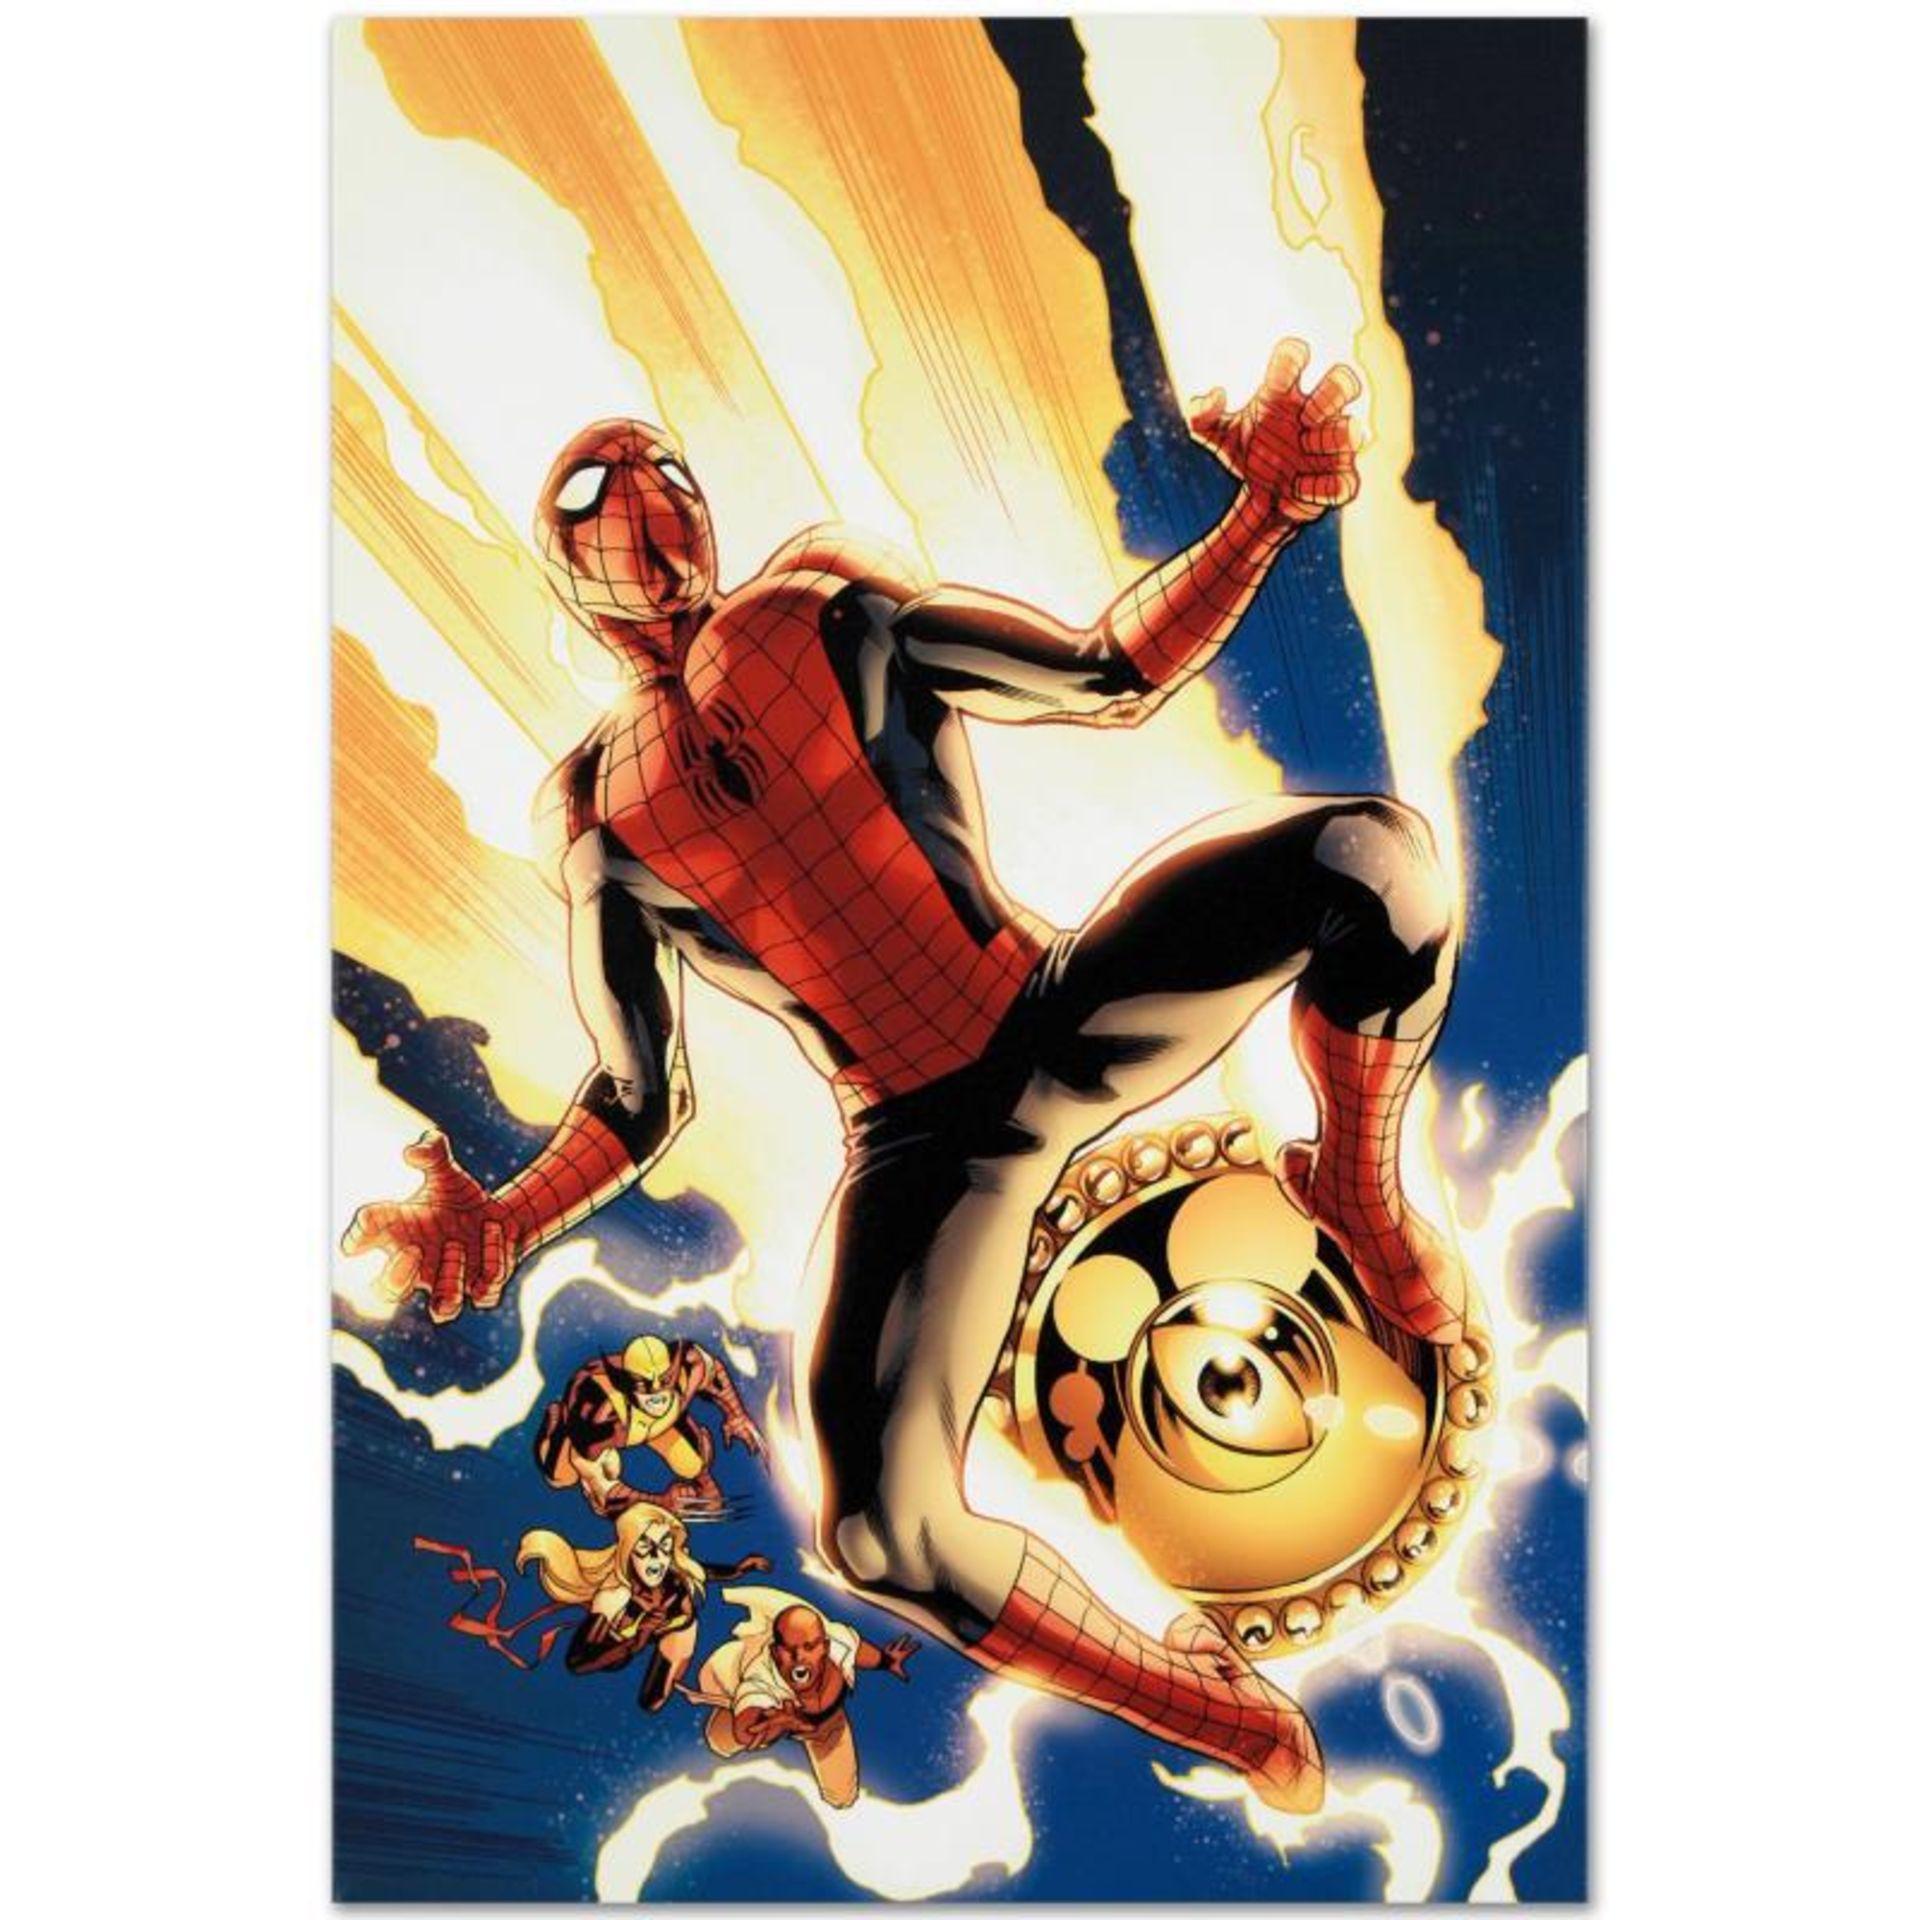 New Avengers #4 by Marvel Comics